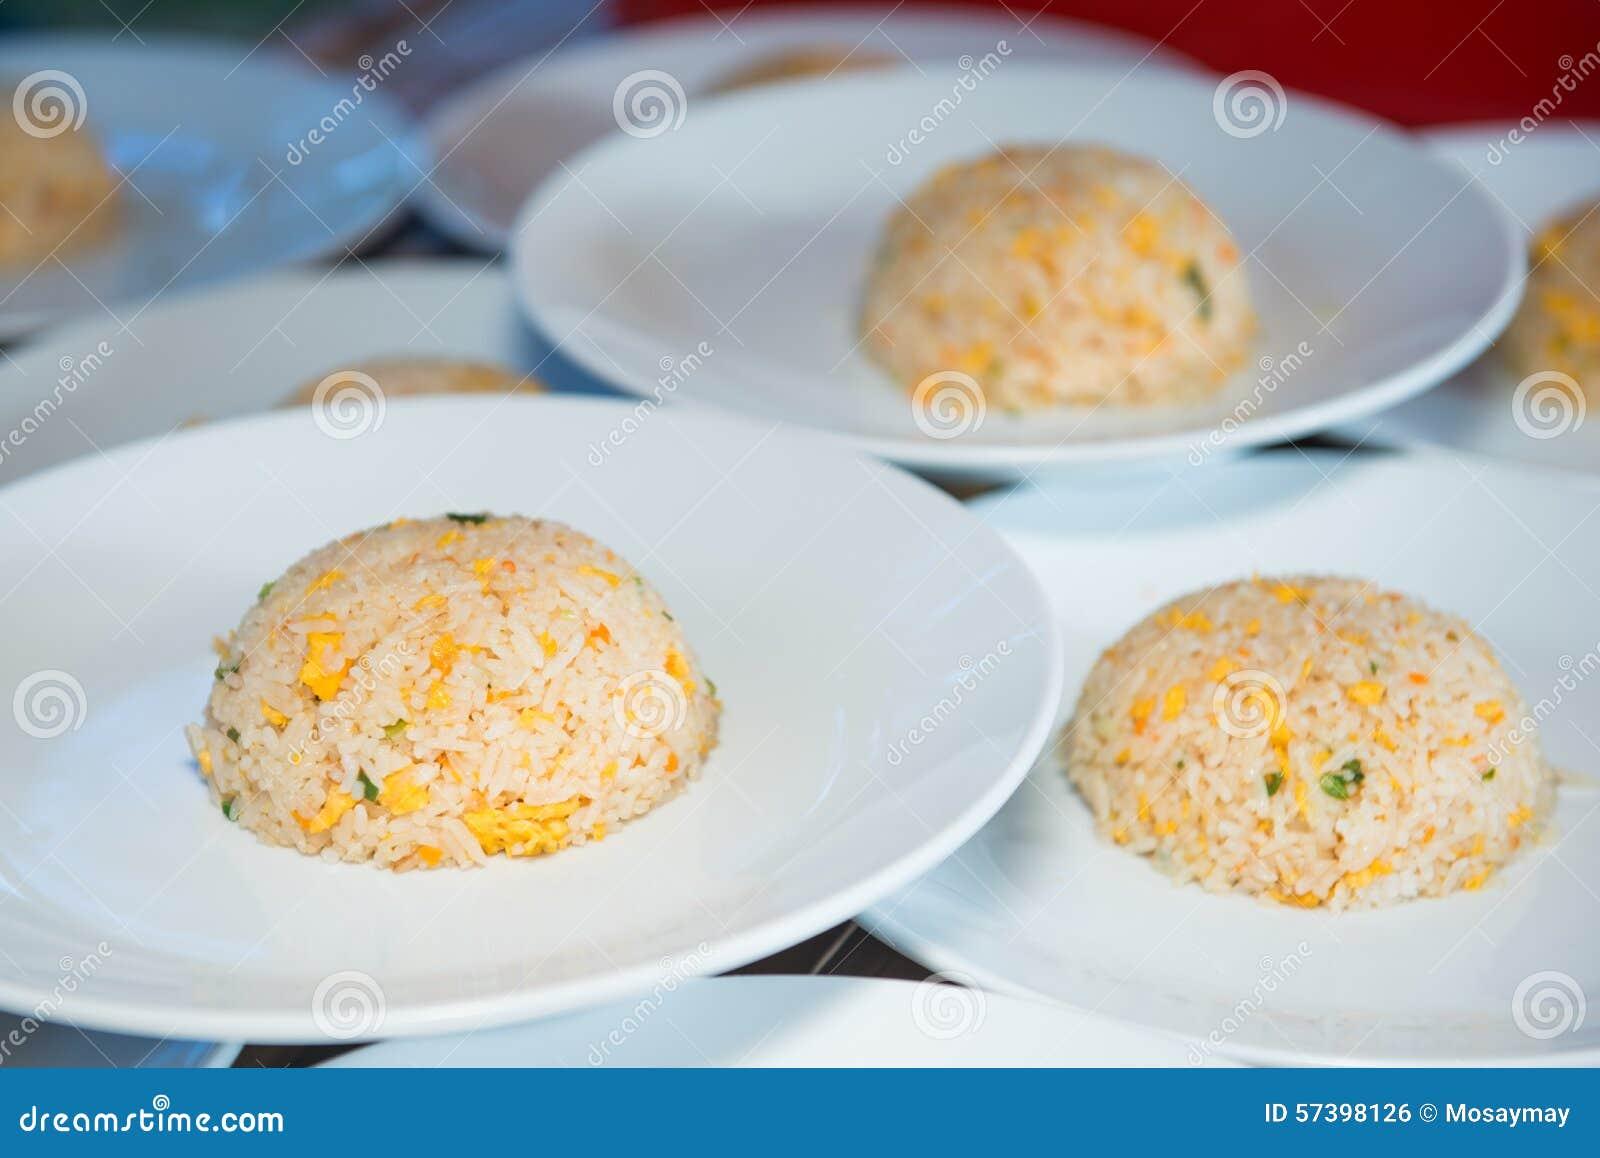 Ei gebraden rijst op witte schotel